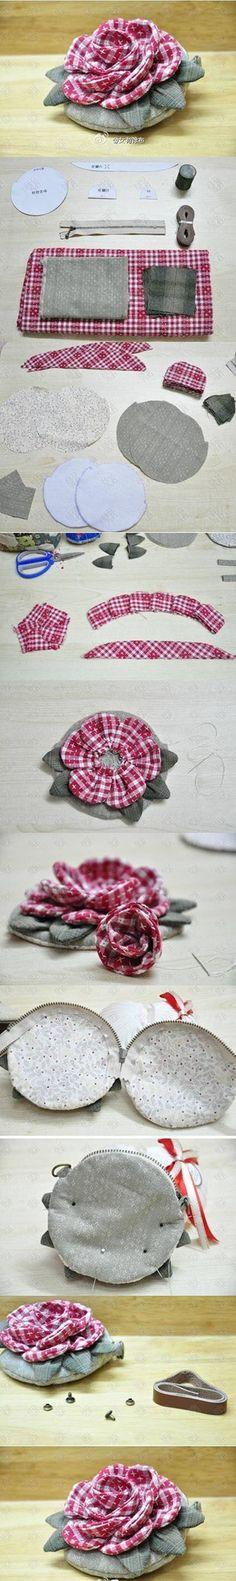 Diy Cloth Flower   DIY & Crafts